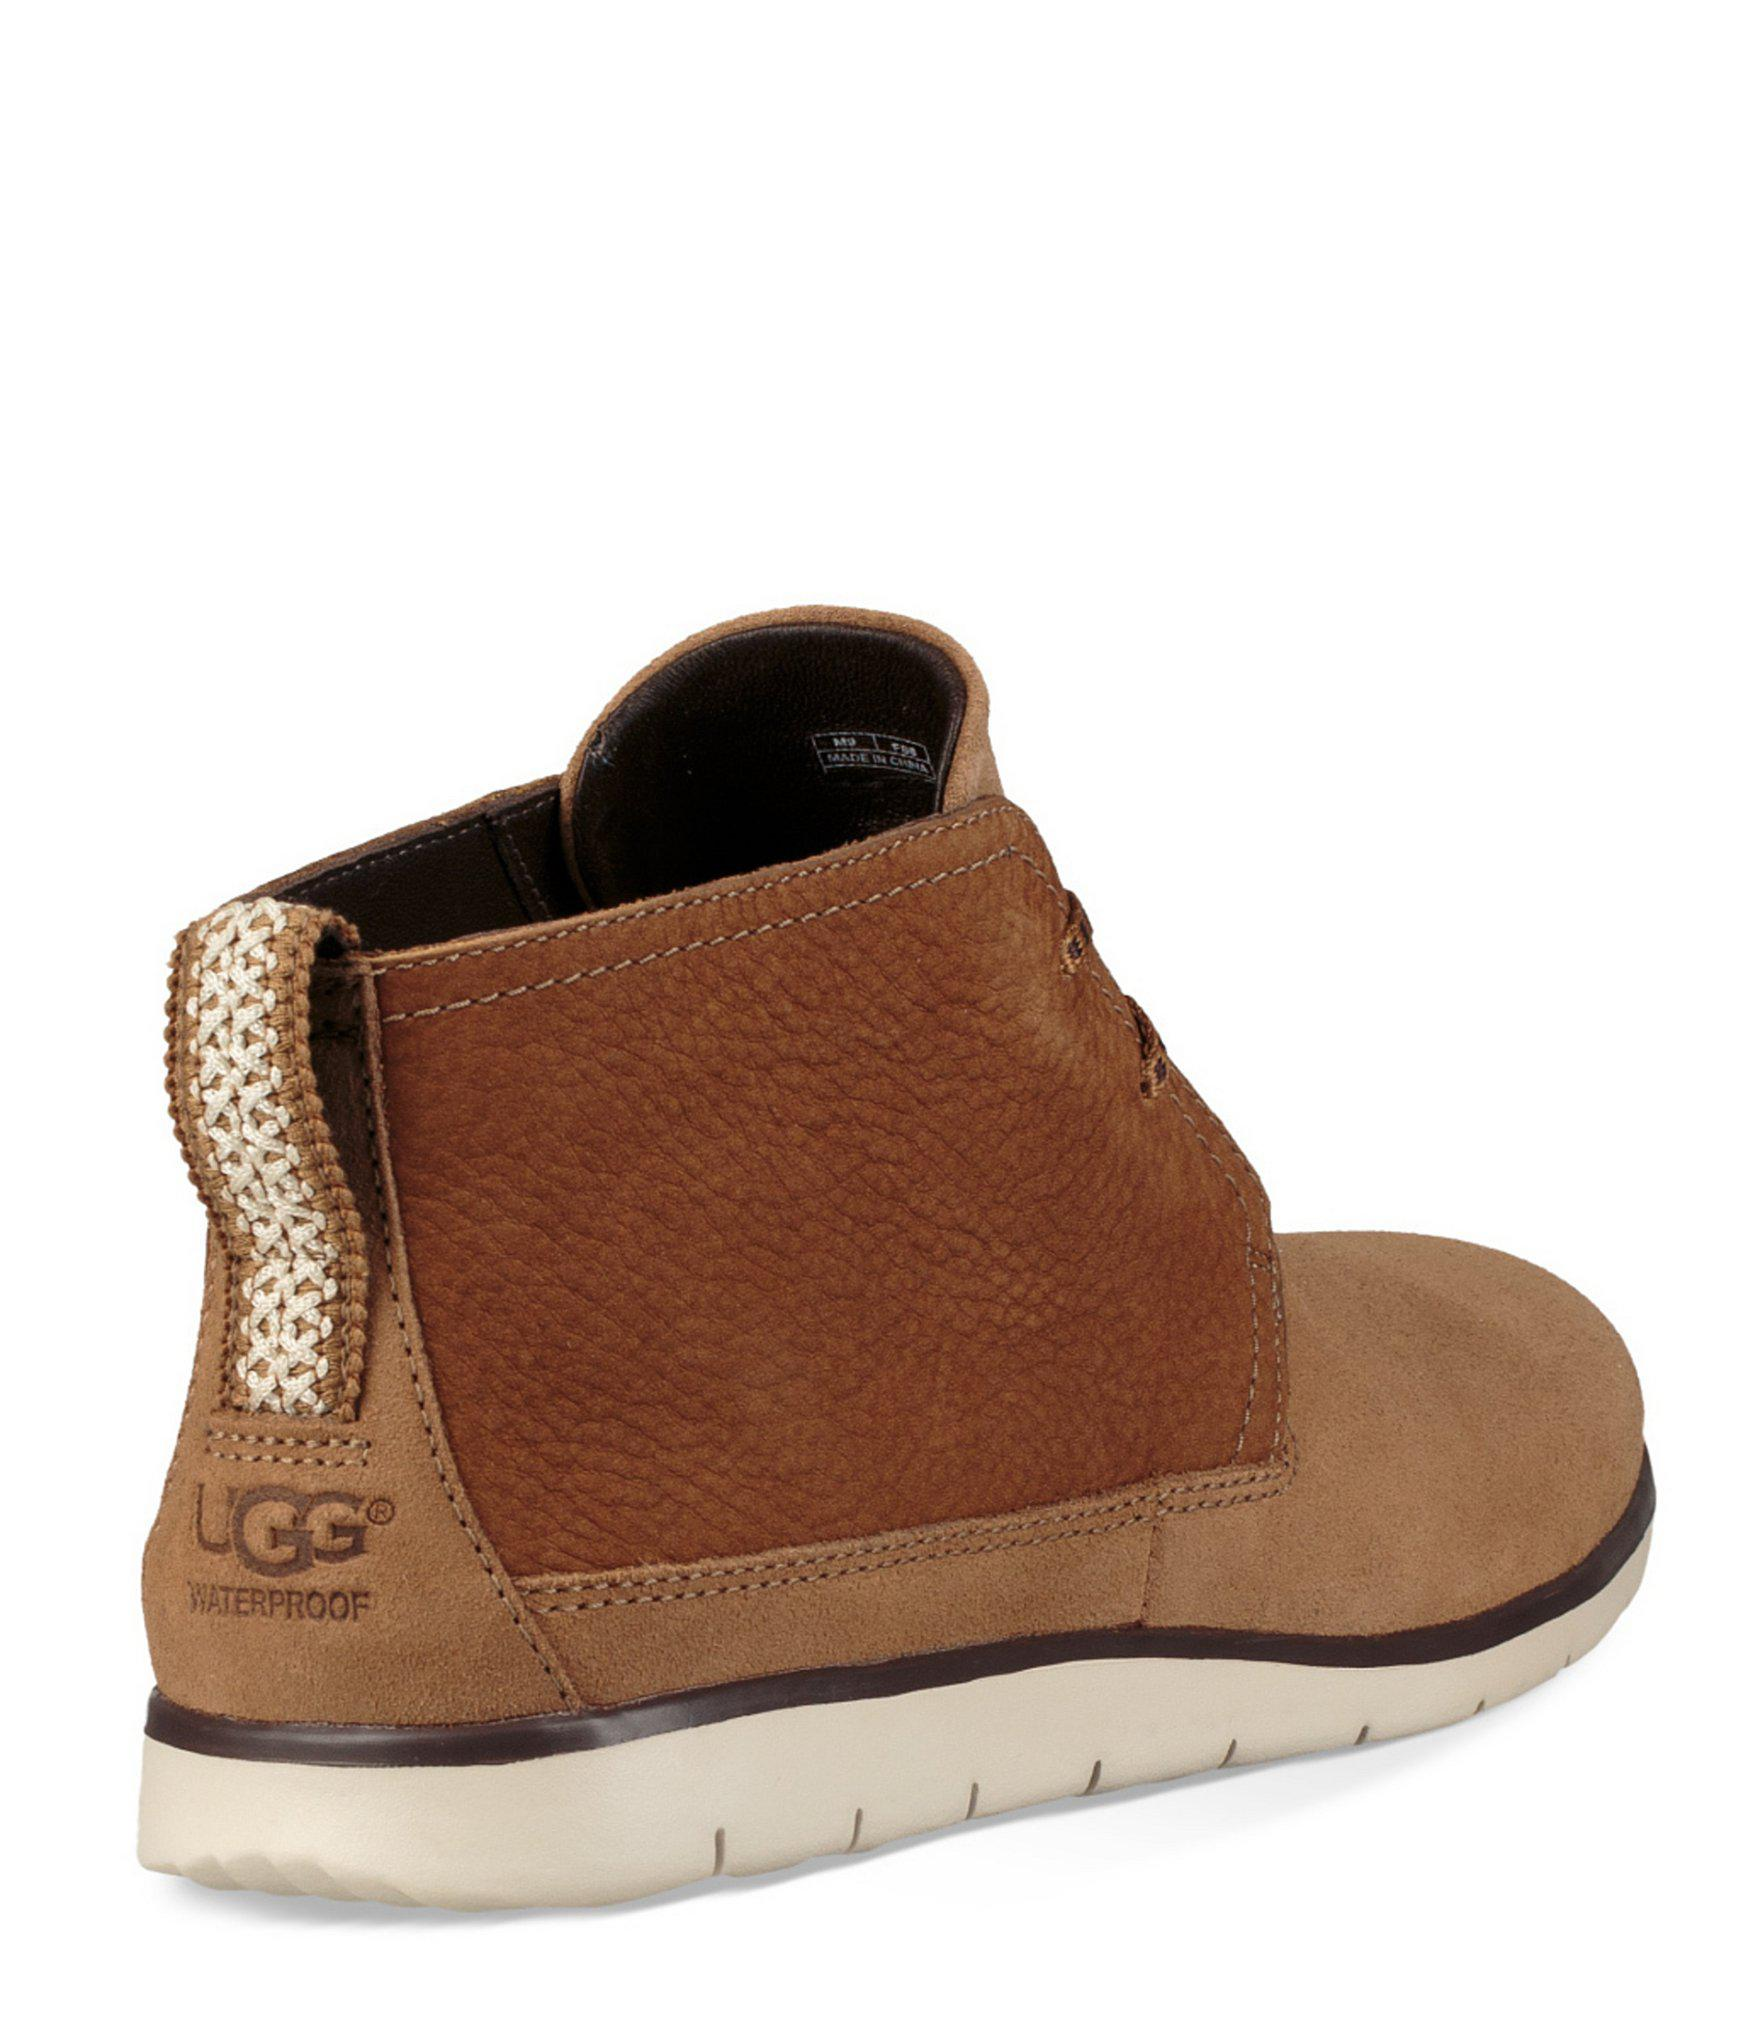 c7bc8a0008e Ugg Brown Men's Freamon Waterproof Chukka Boot for men